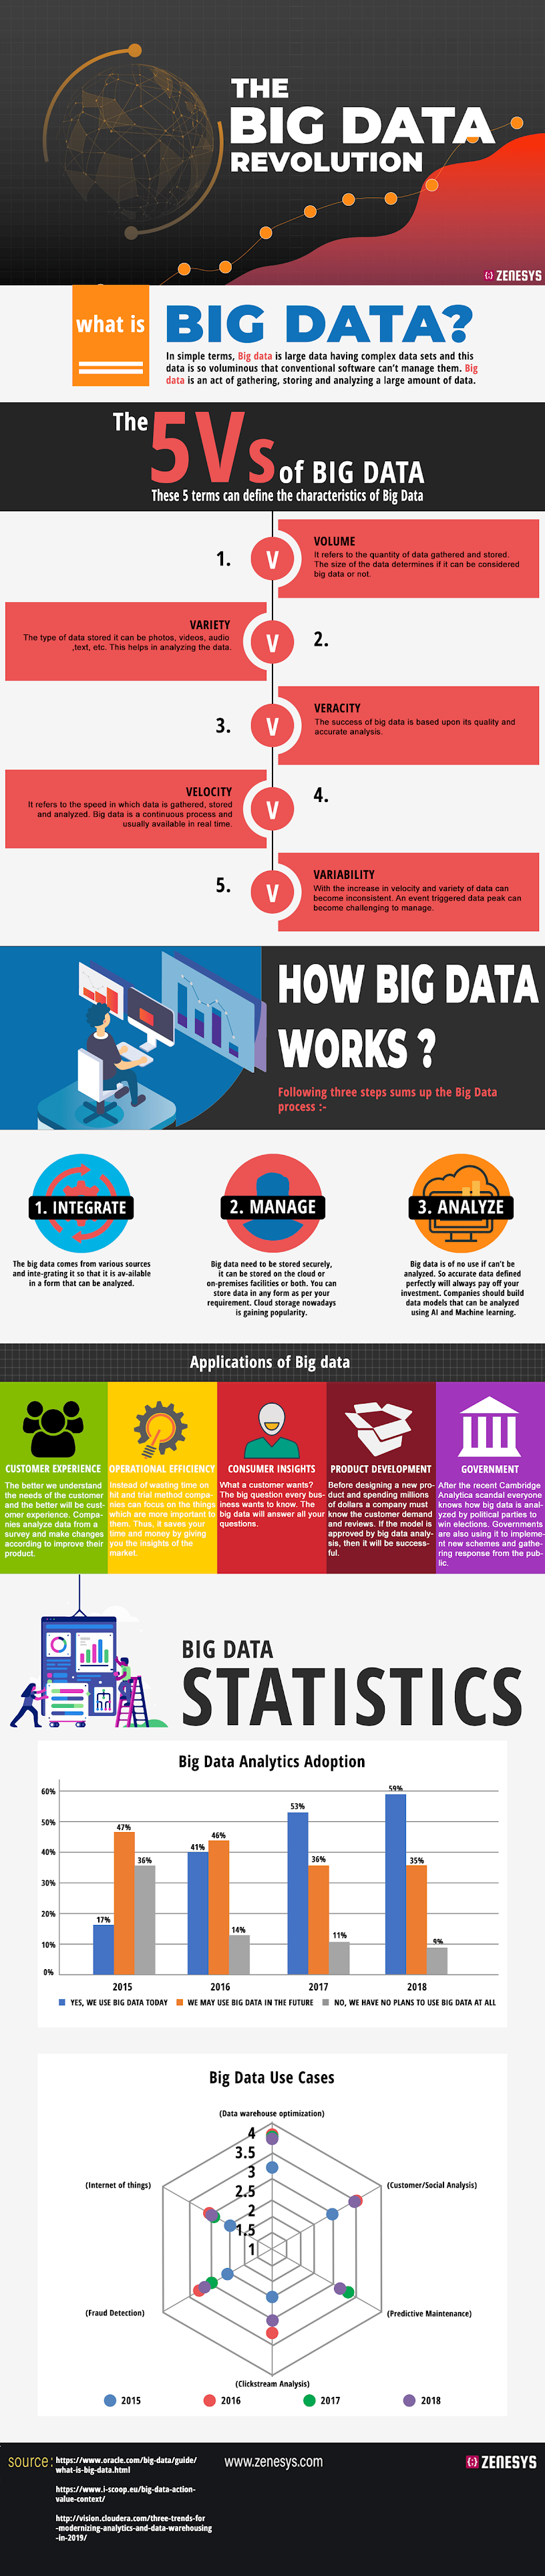 The Big Data Revolution #infographic